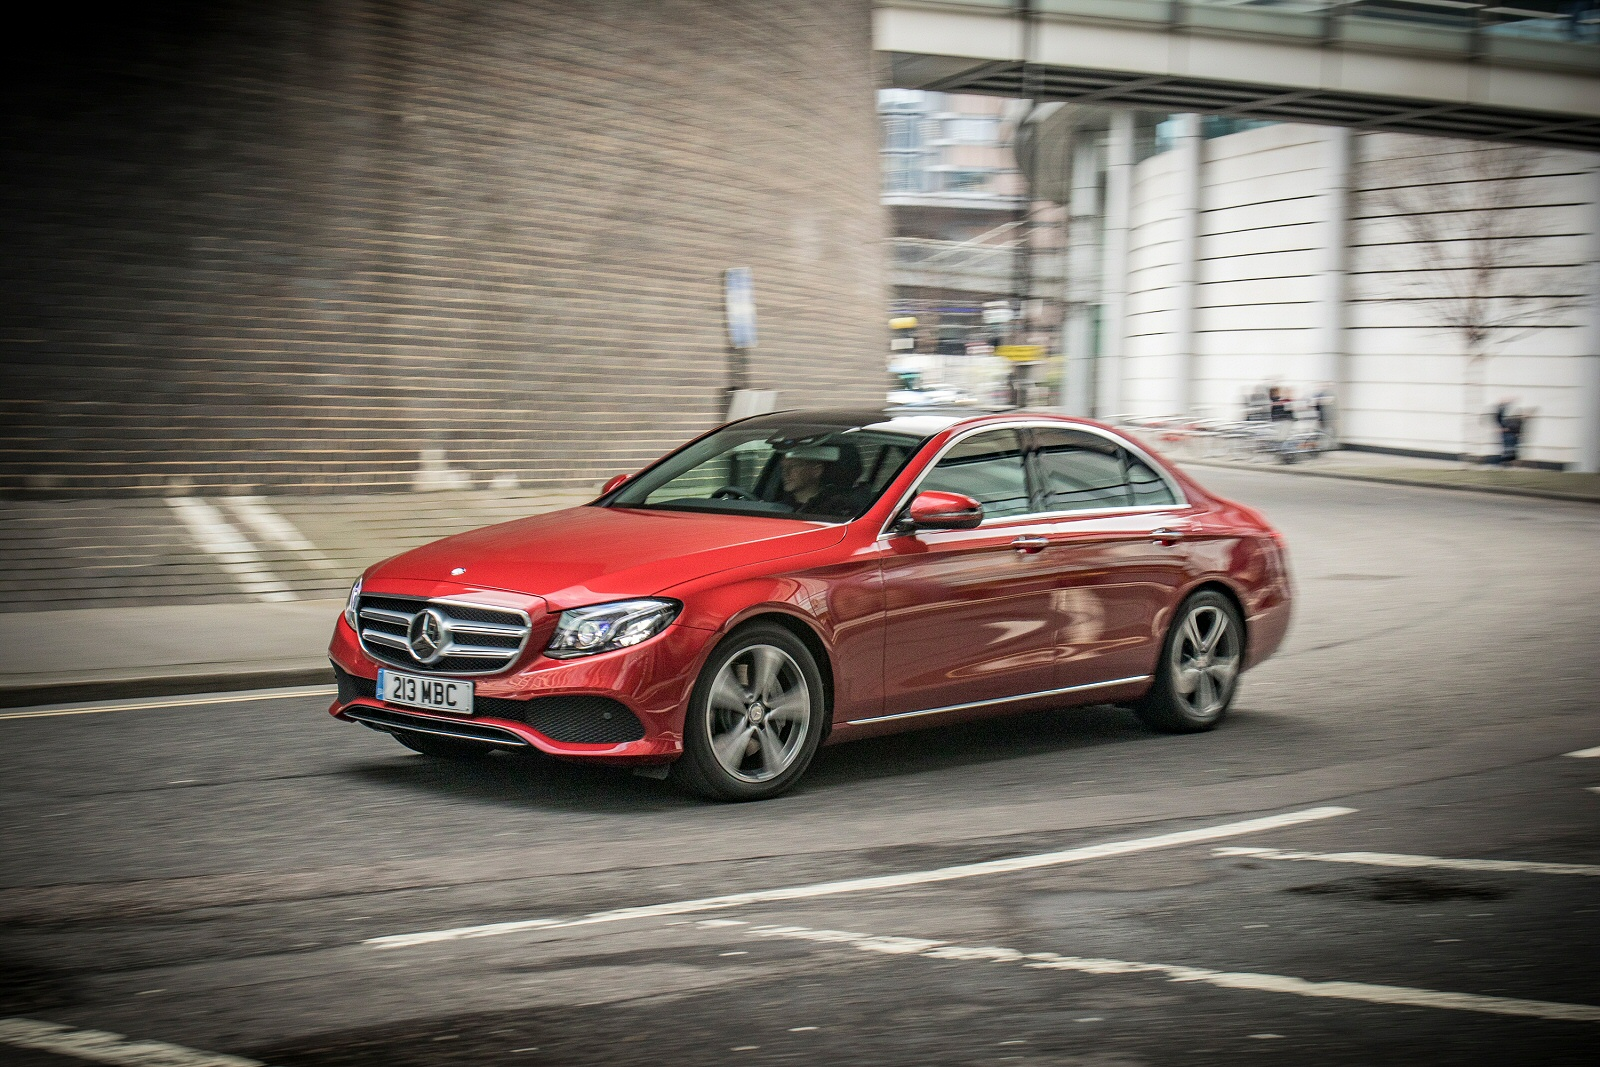 Mercedes-Benz E-Class: Please bear the following in mind